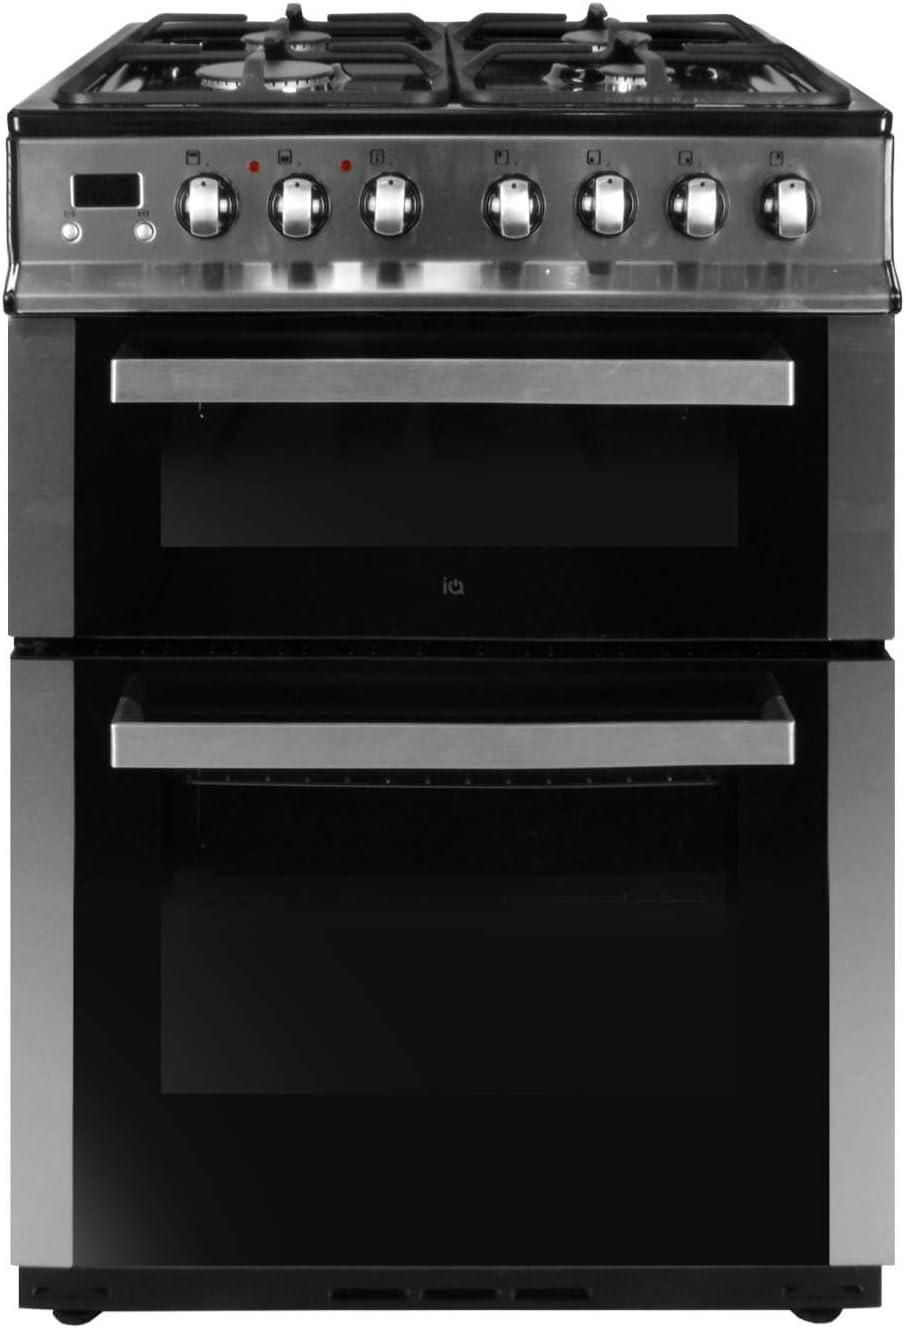 Top 7 Best Dual Fuel Cooker 60cm [Expert's Choice - 2021] 4